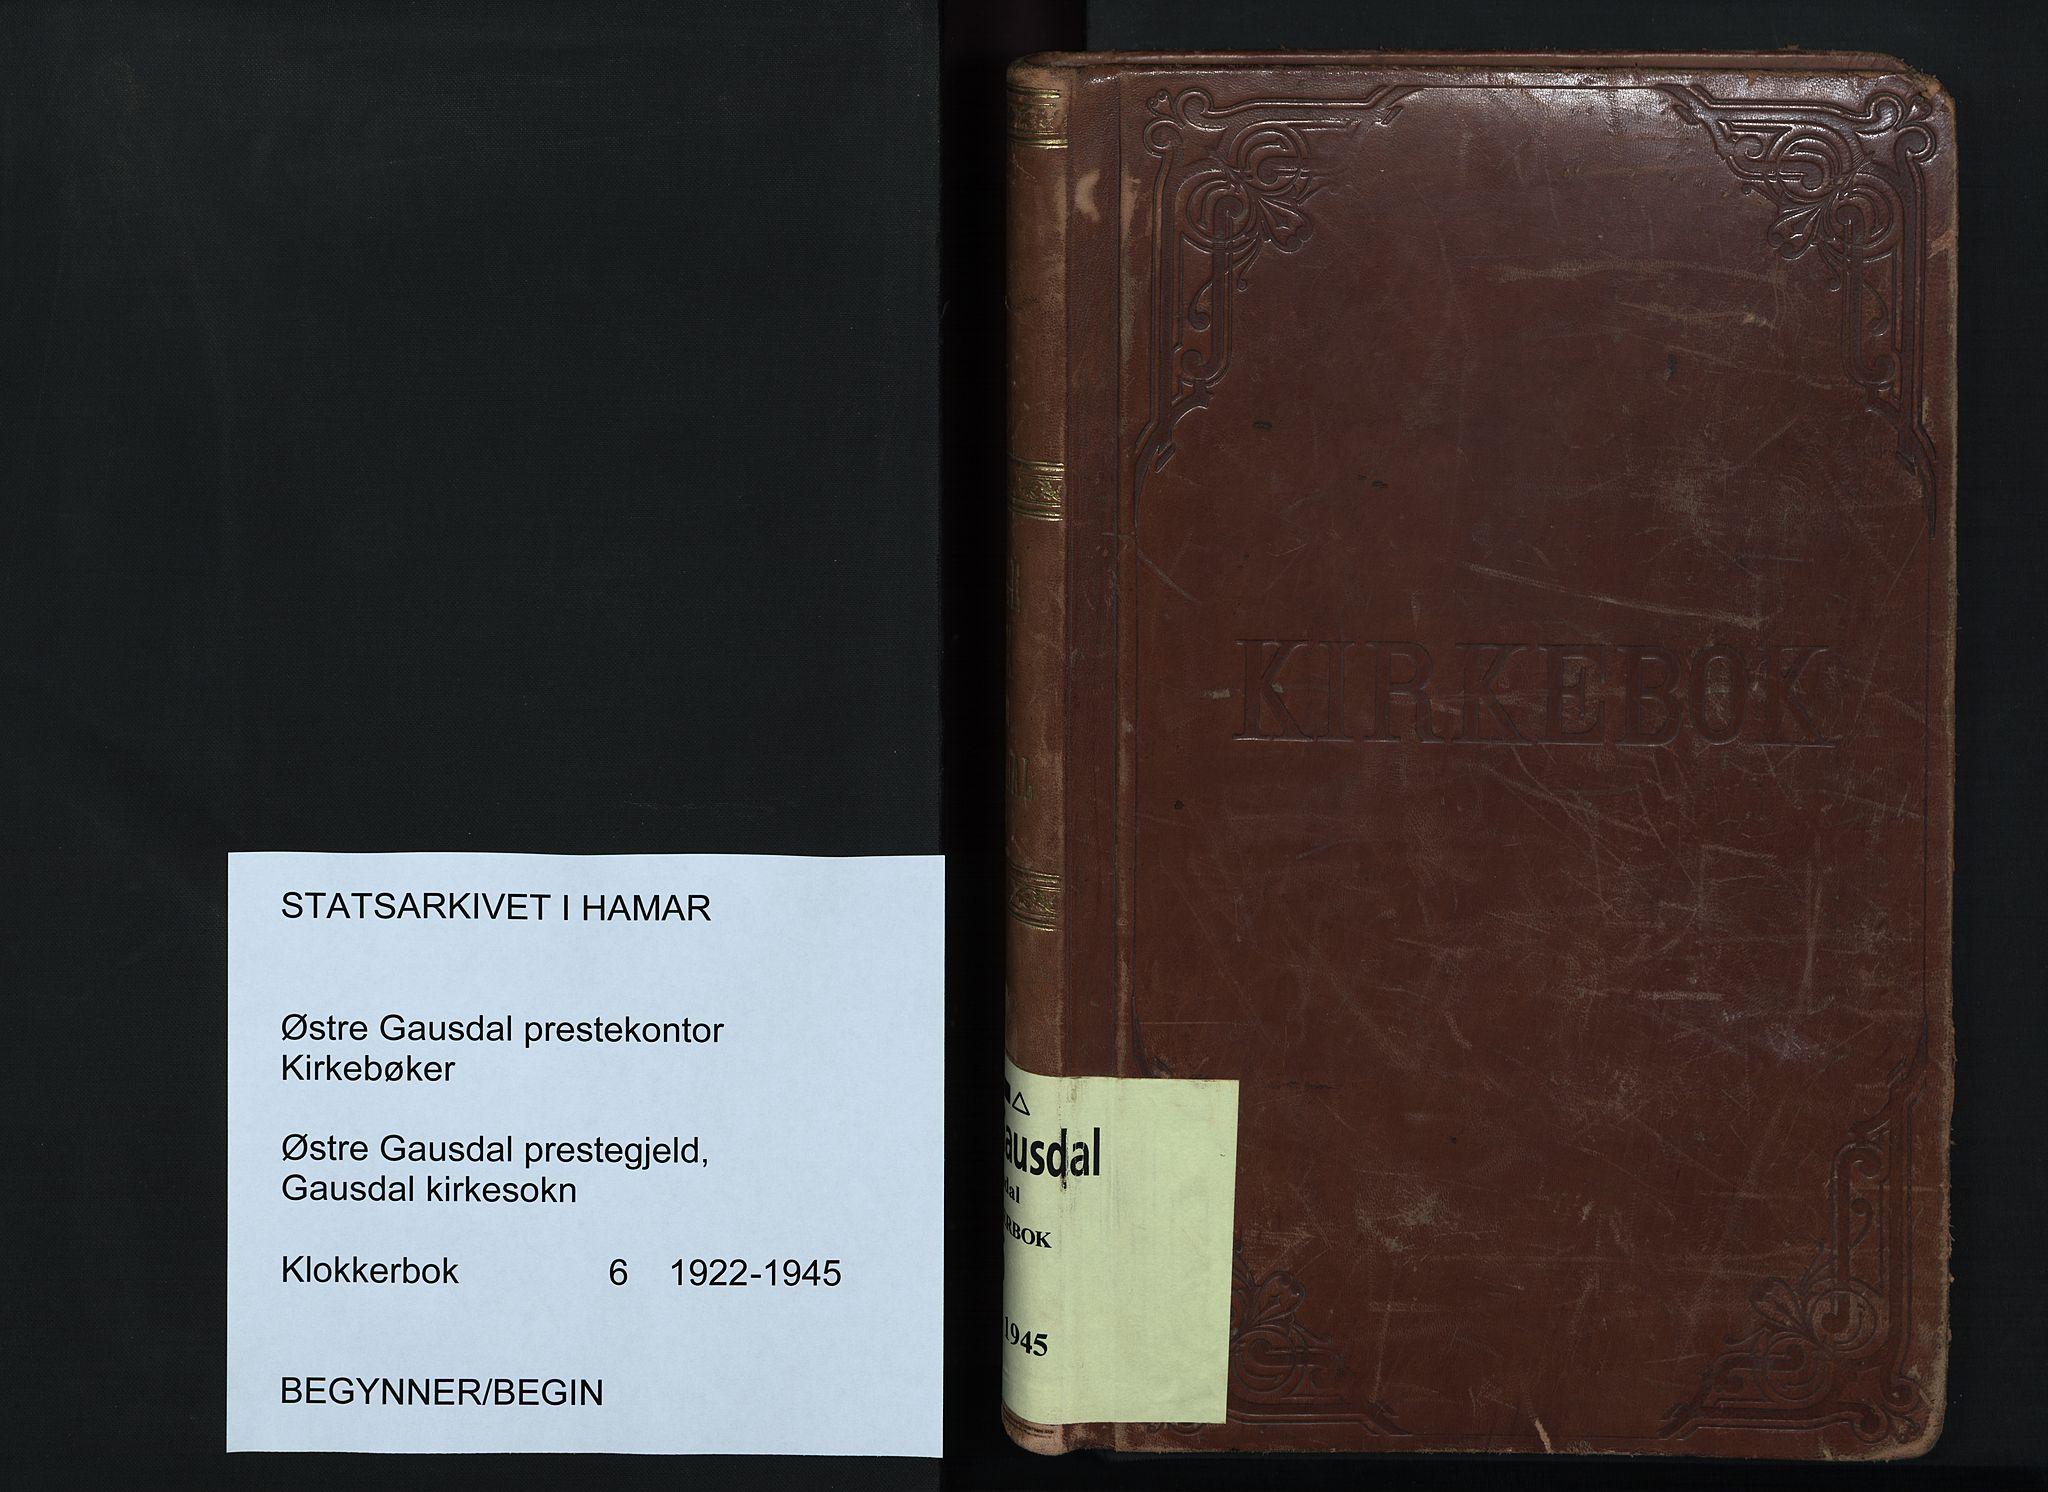 SAH, Østre Gausdal prestekontor, Klokkerbok nr. 6, 1922-1945